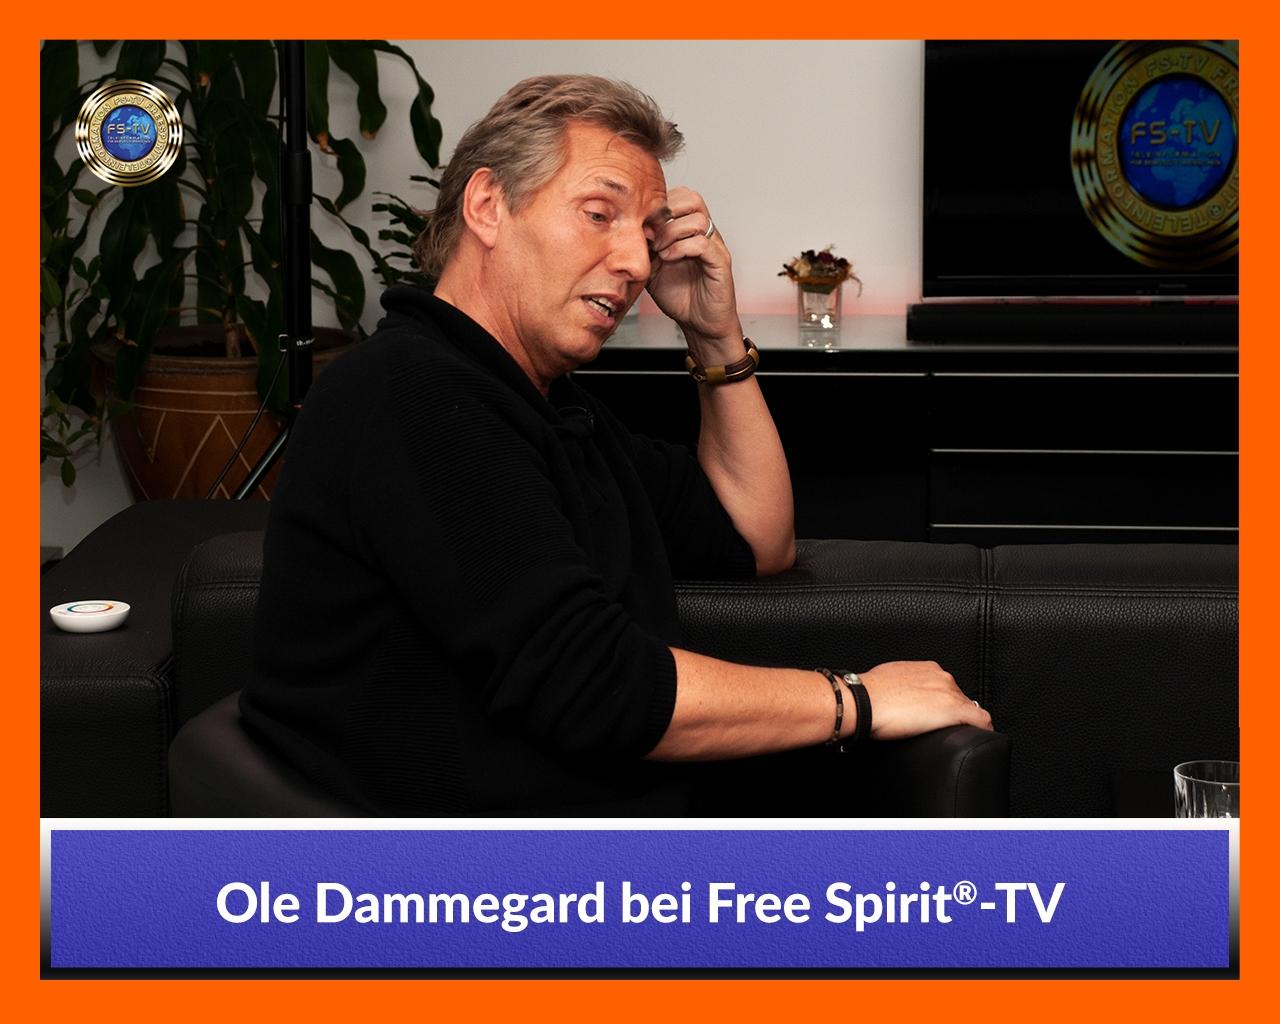 Galleriebild-Ole-Dammegard-7